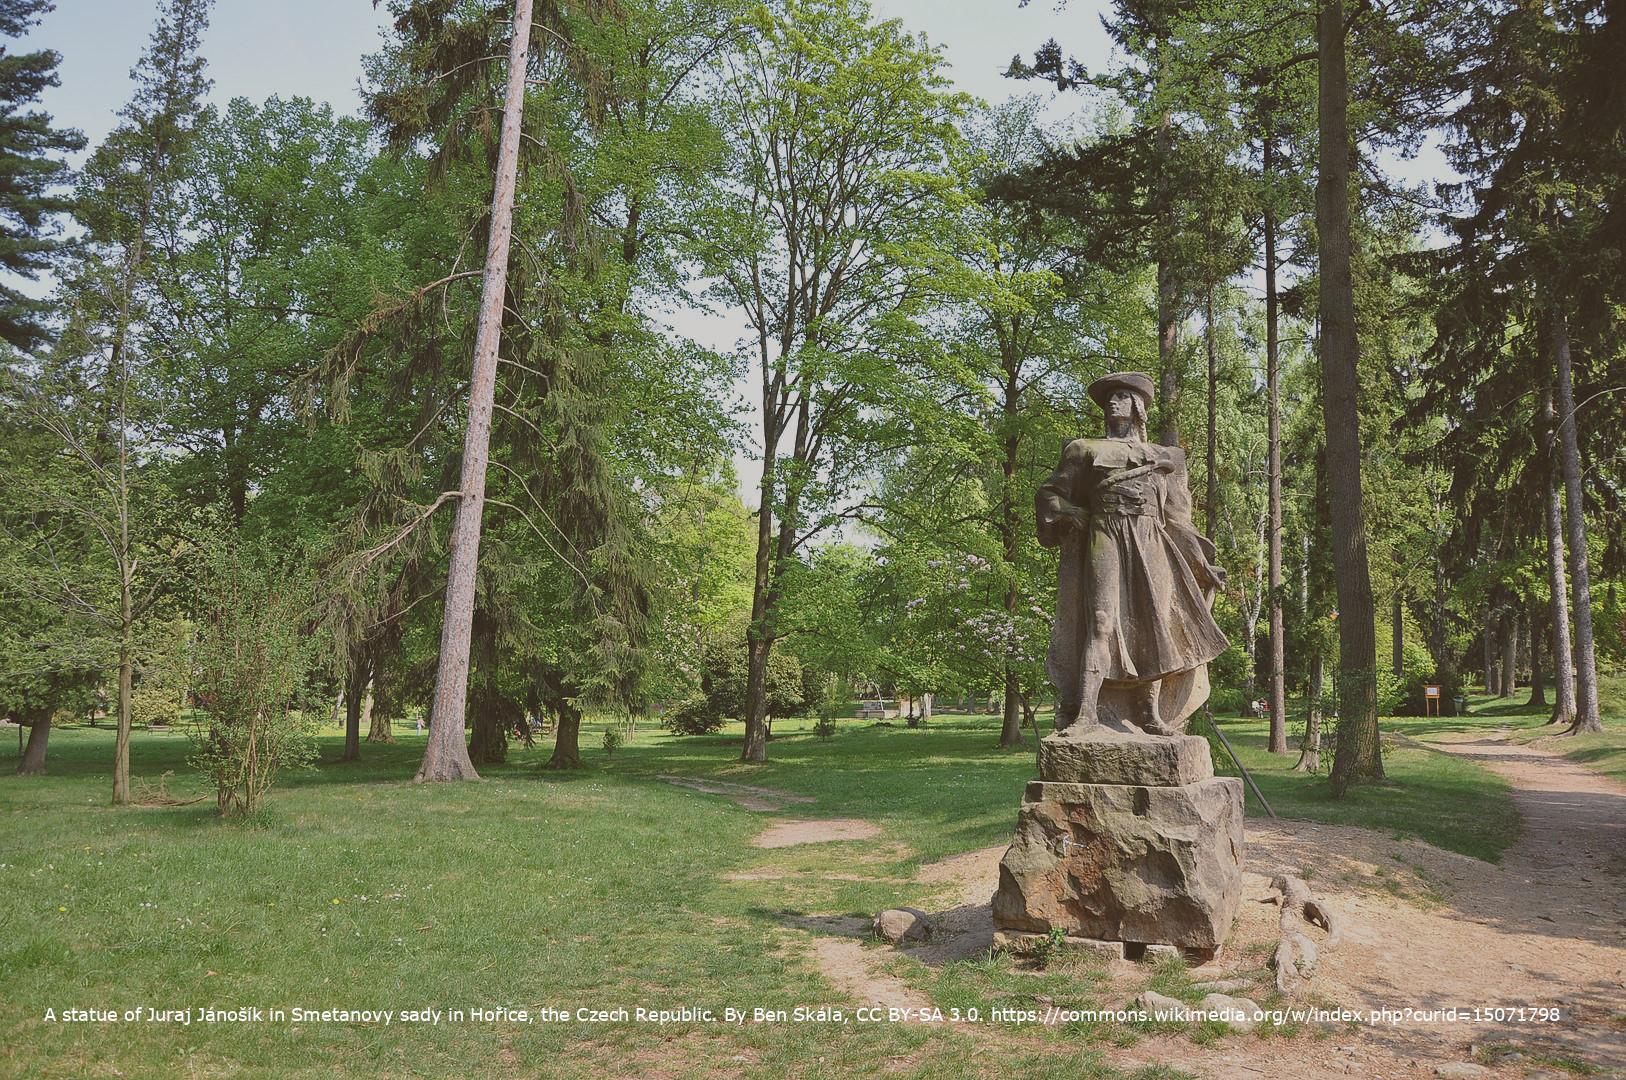 A statue of Juraj Jánošík in Smetanovy sady in Hořice, the Czech Republic. By Ben Skála, CC BY-SA 3.0. https://commons.wikimedia.org/w/index.php?curid=15071798